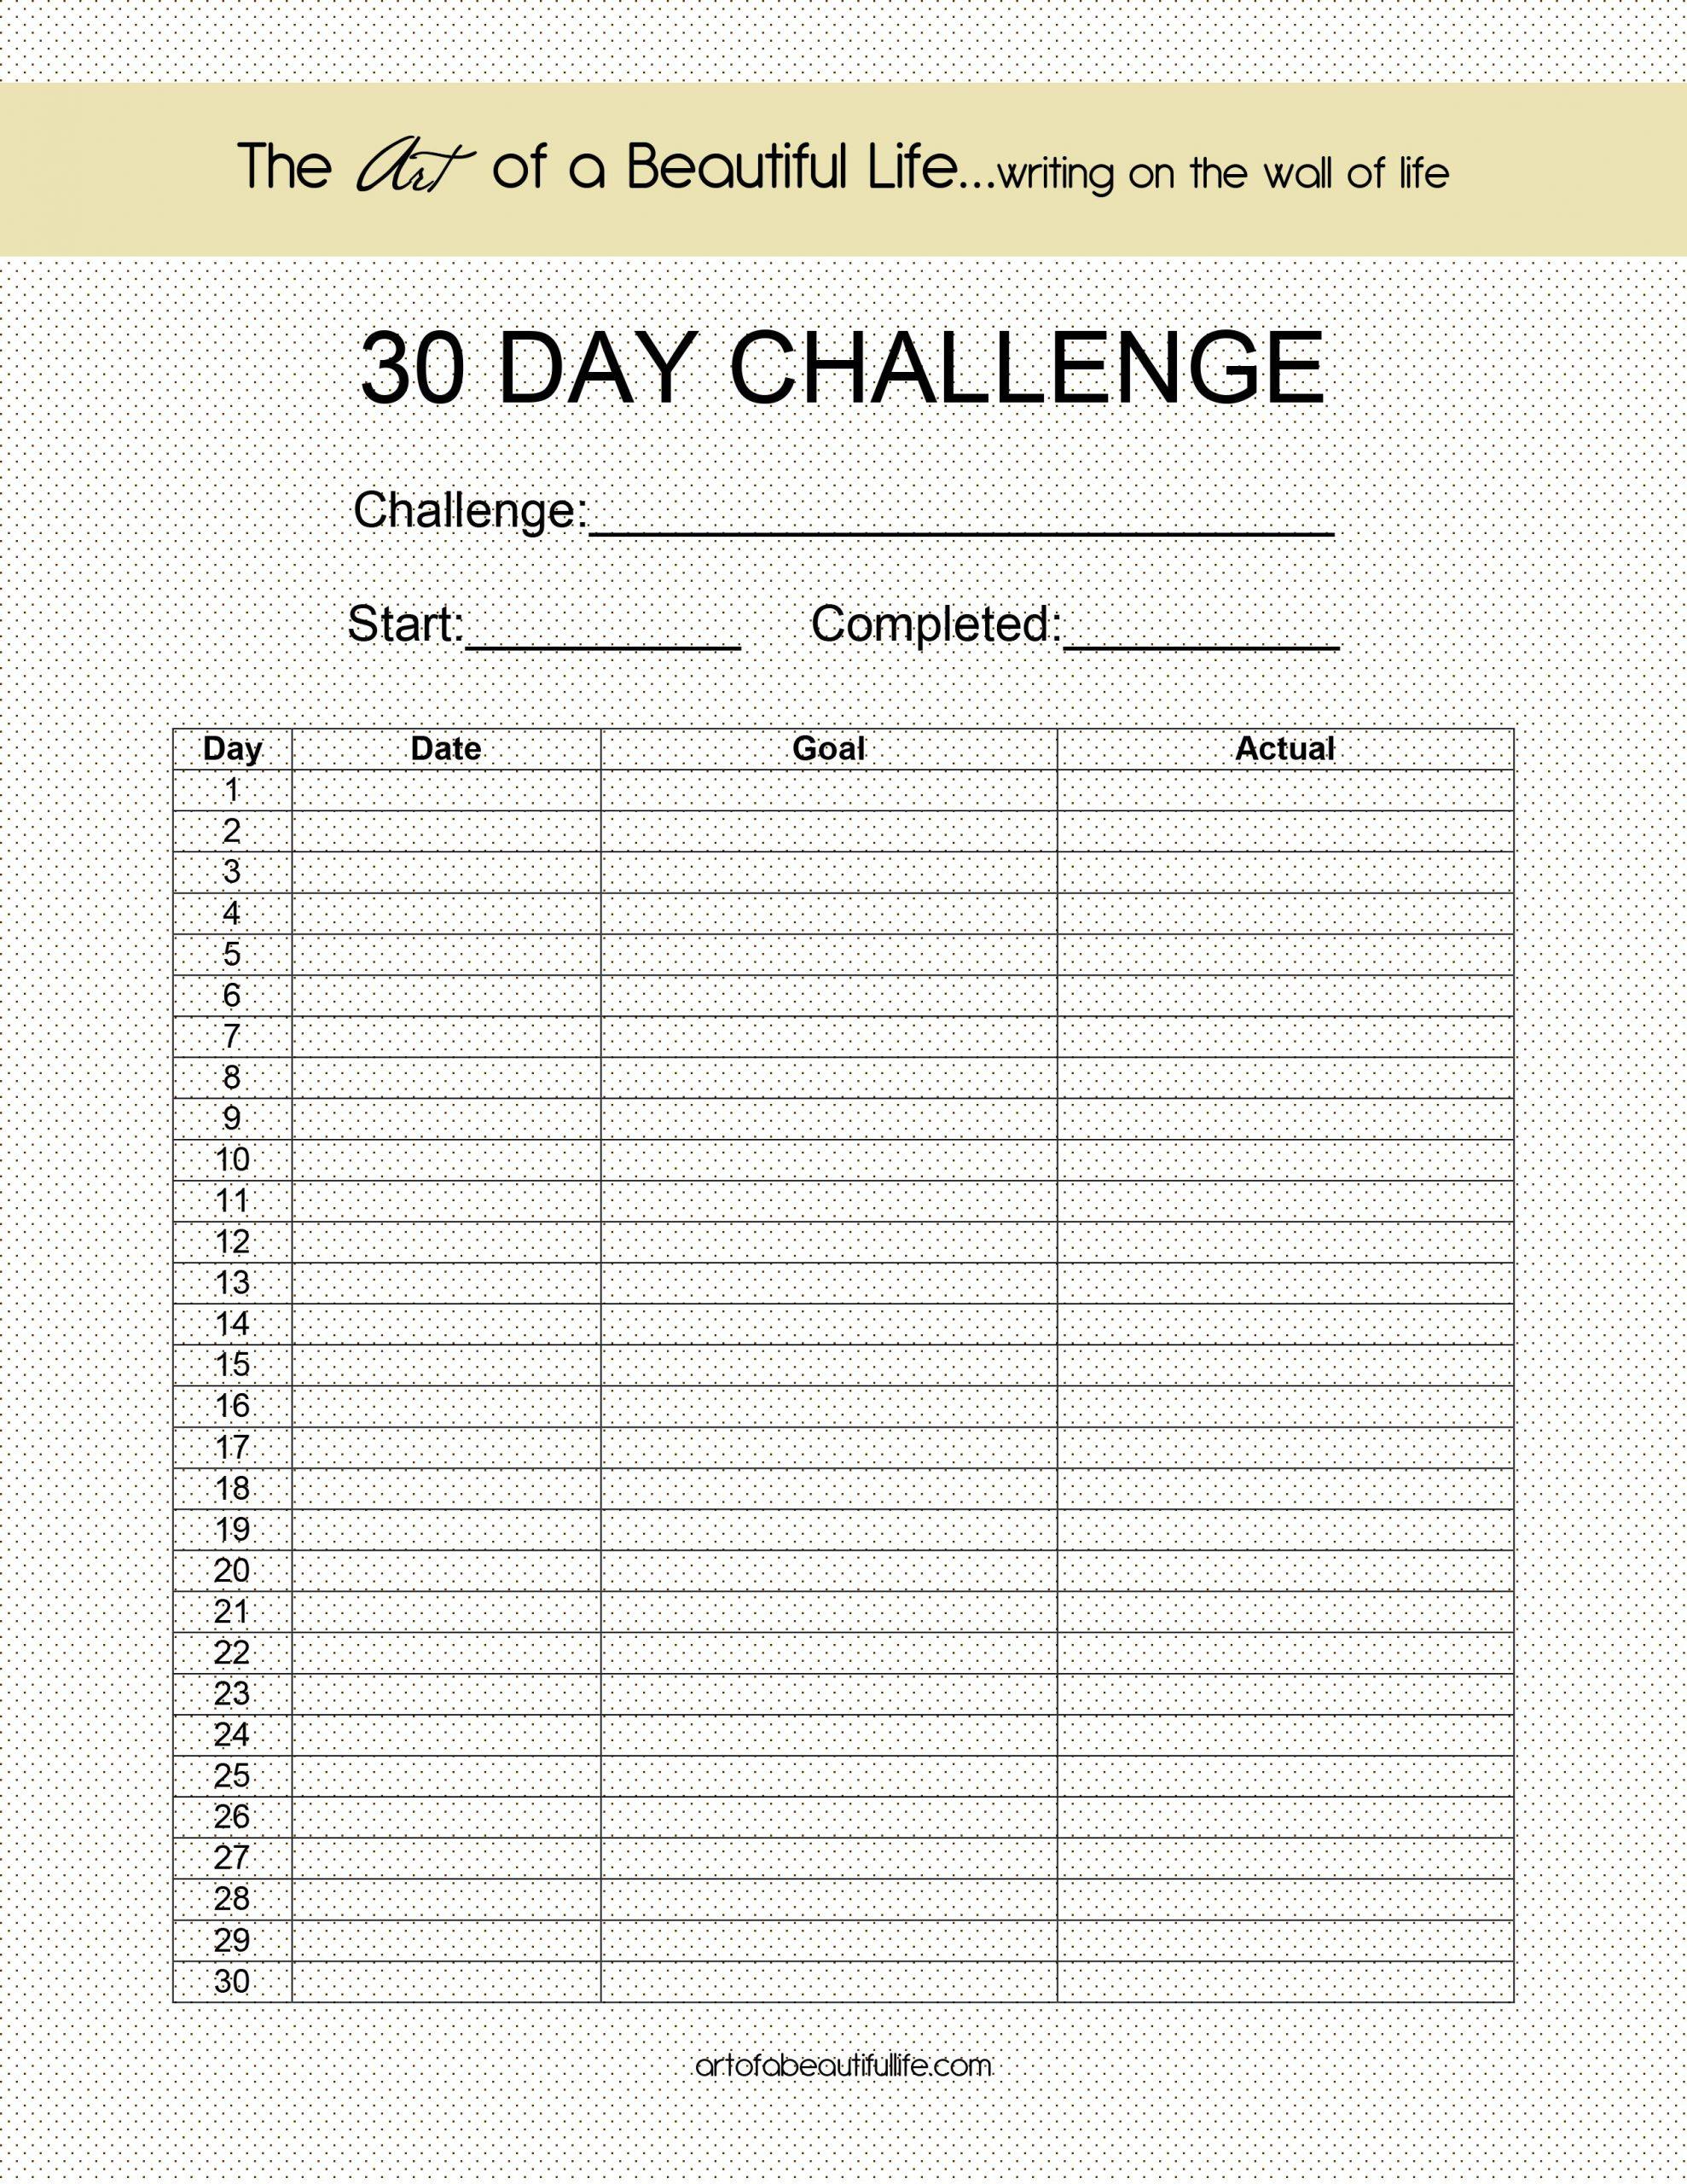 Blank 30 Day Fitness Calendar | Printable Calendar 2020-2021 within 30 Day Fitness Calendar Printable